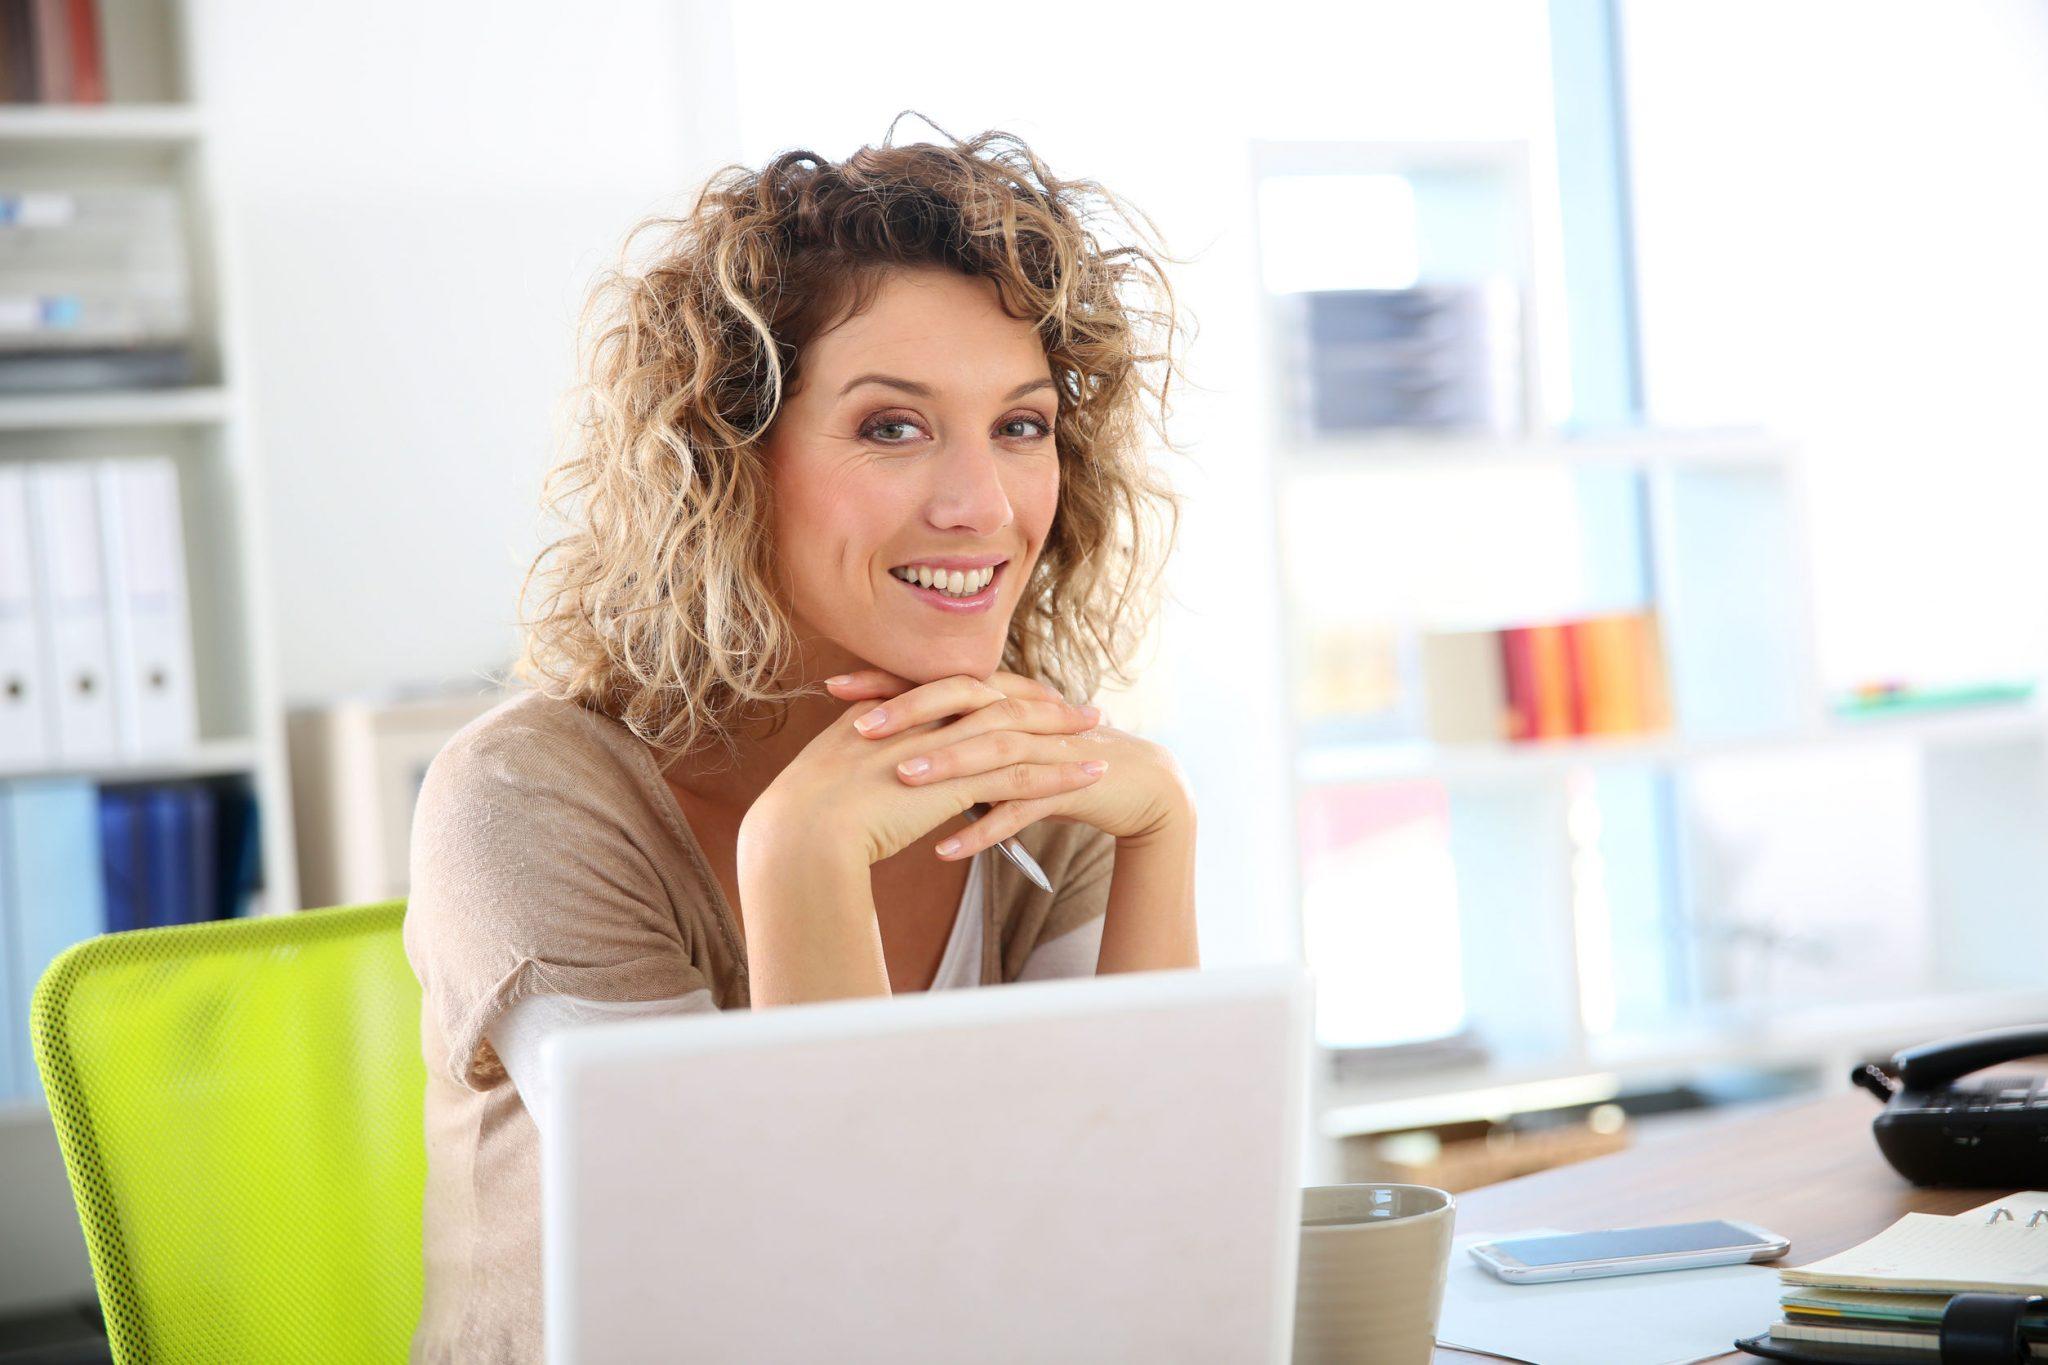 femme entrepreneure organisée et heureuse